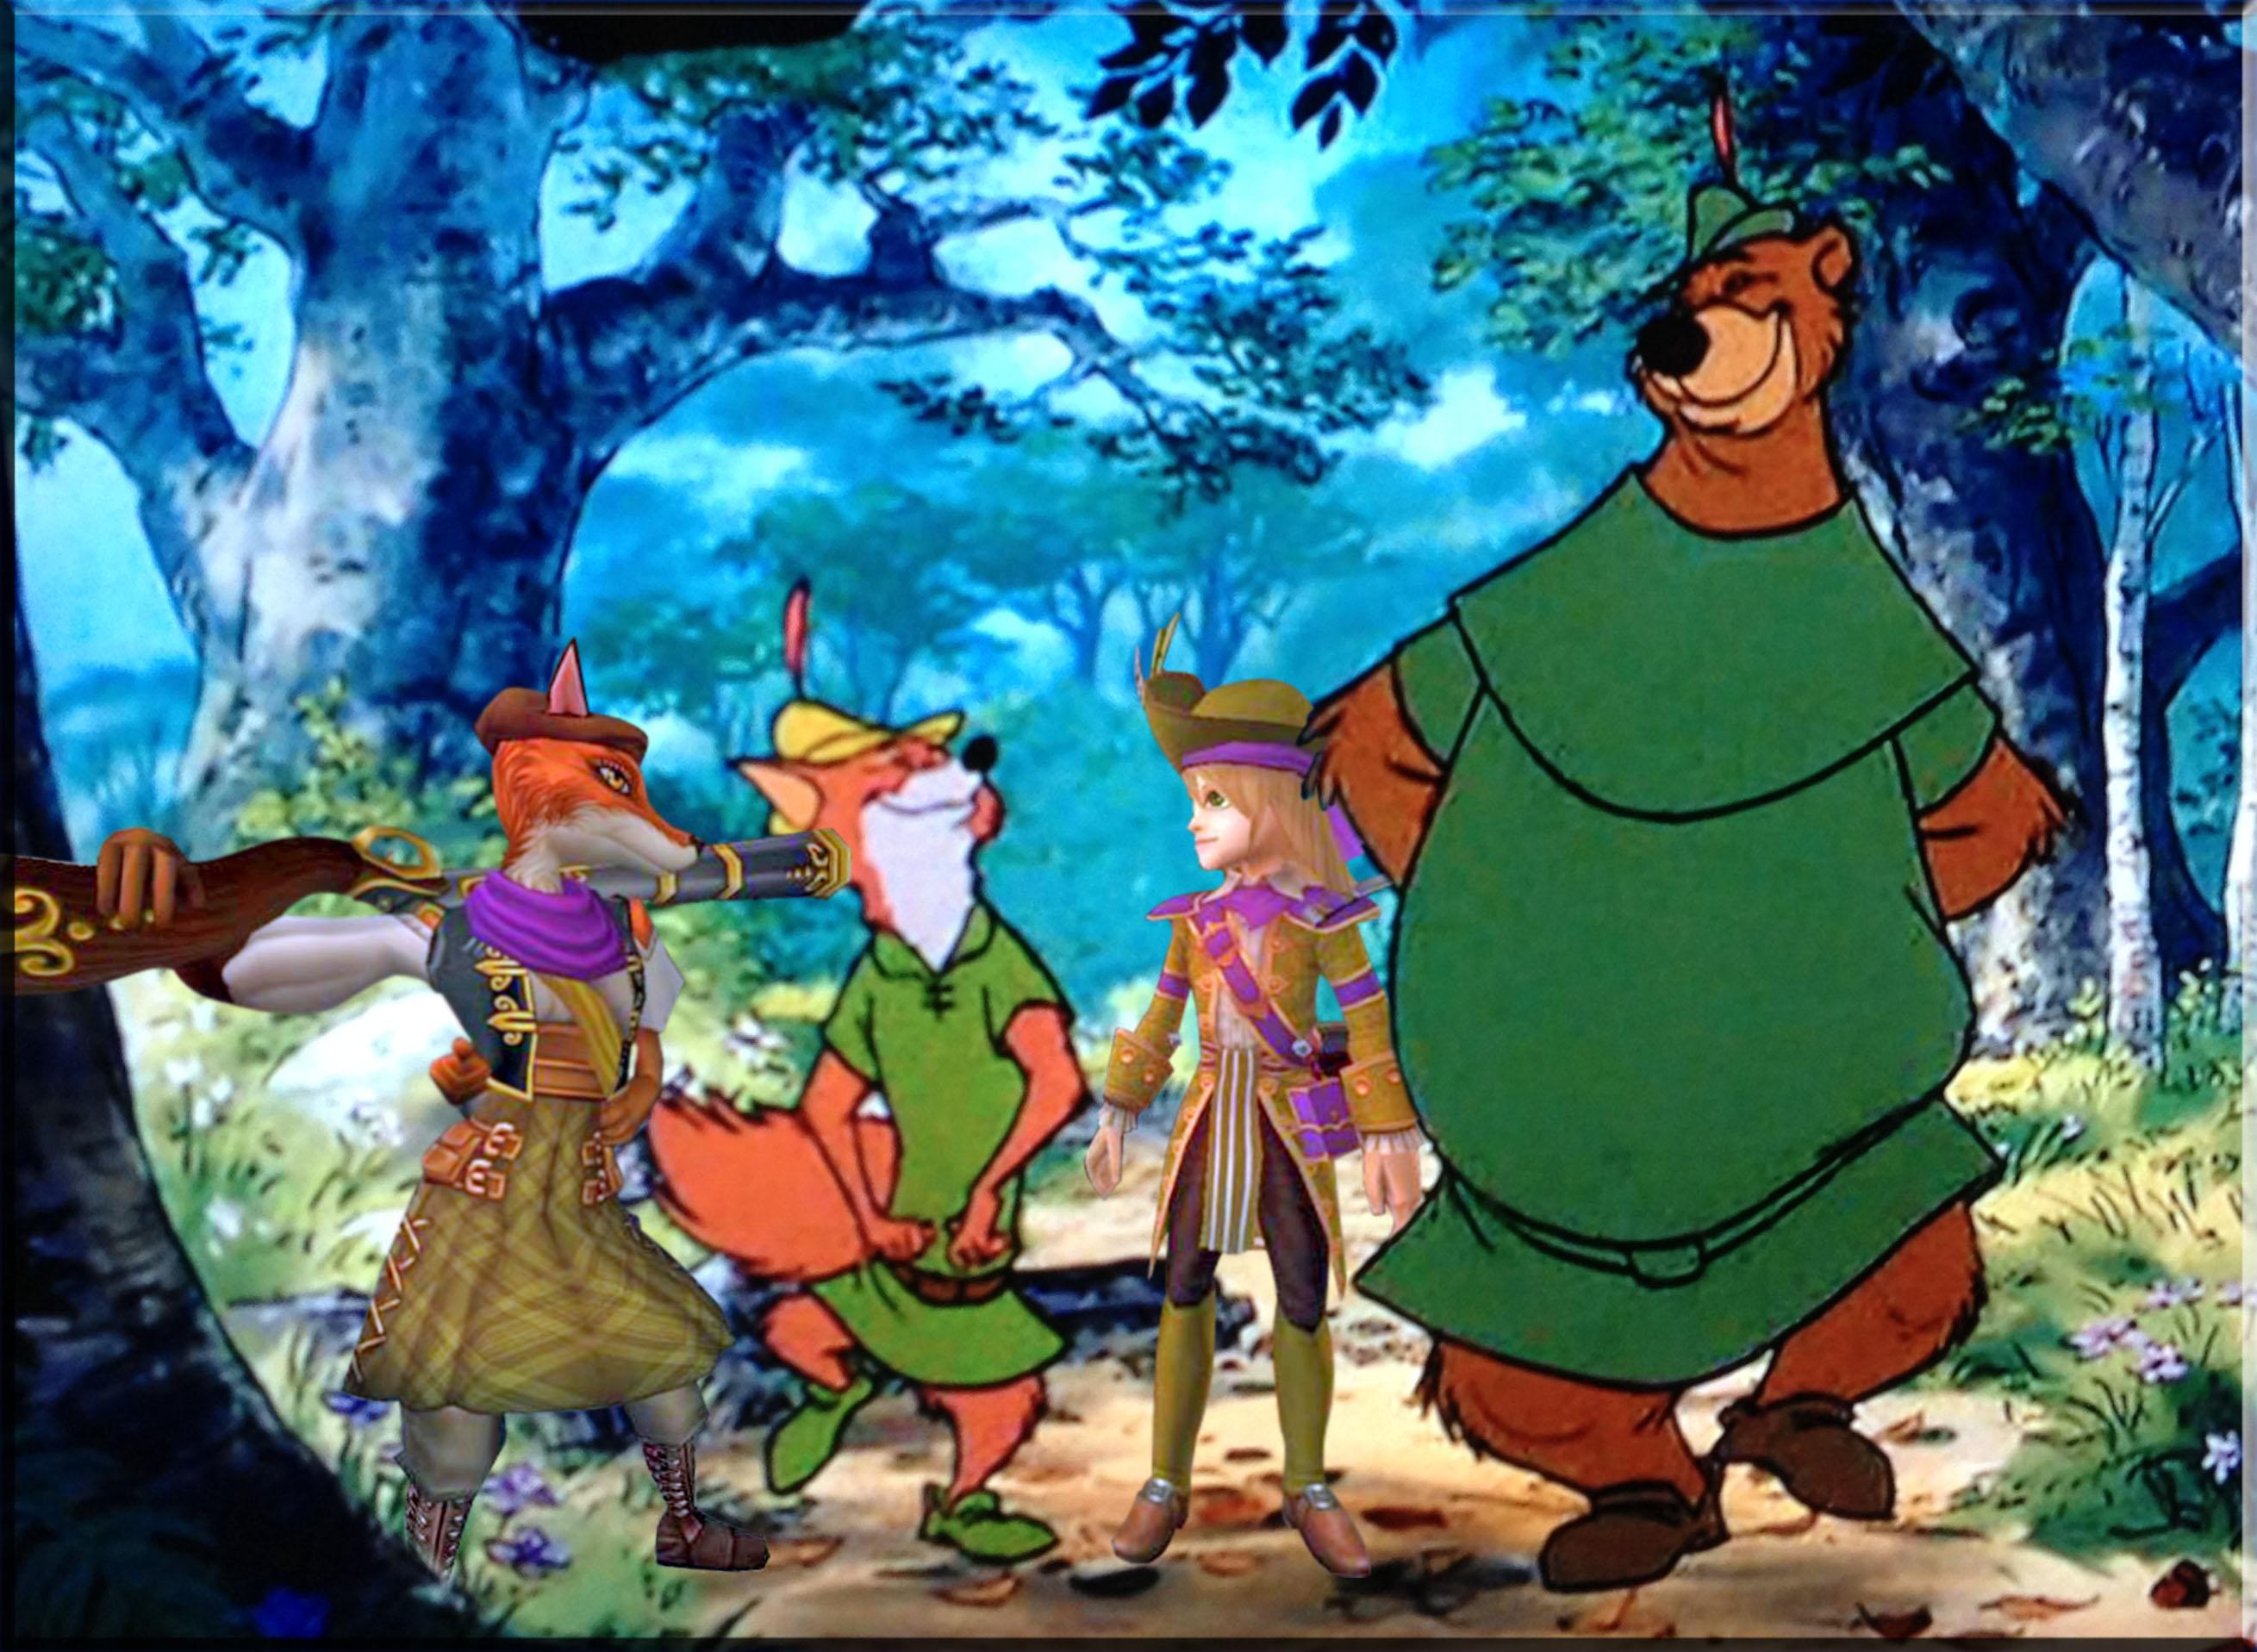 Chrissy & Bonnie Anne With Robin Hood & Little John oo-de-lally